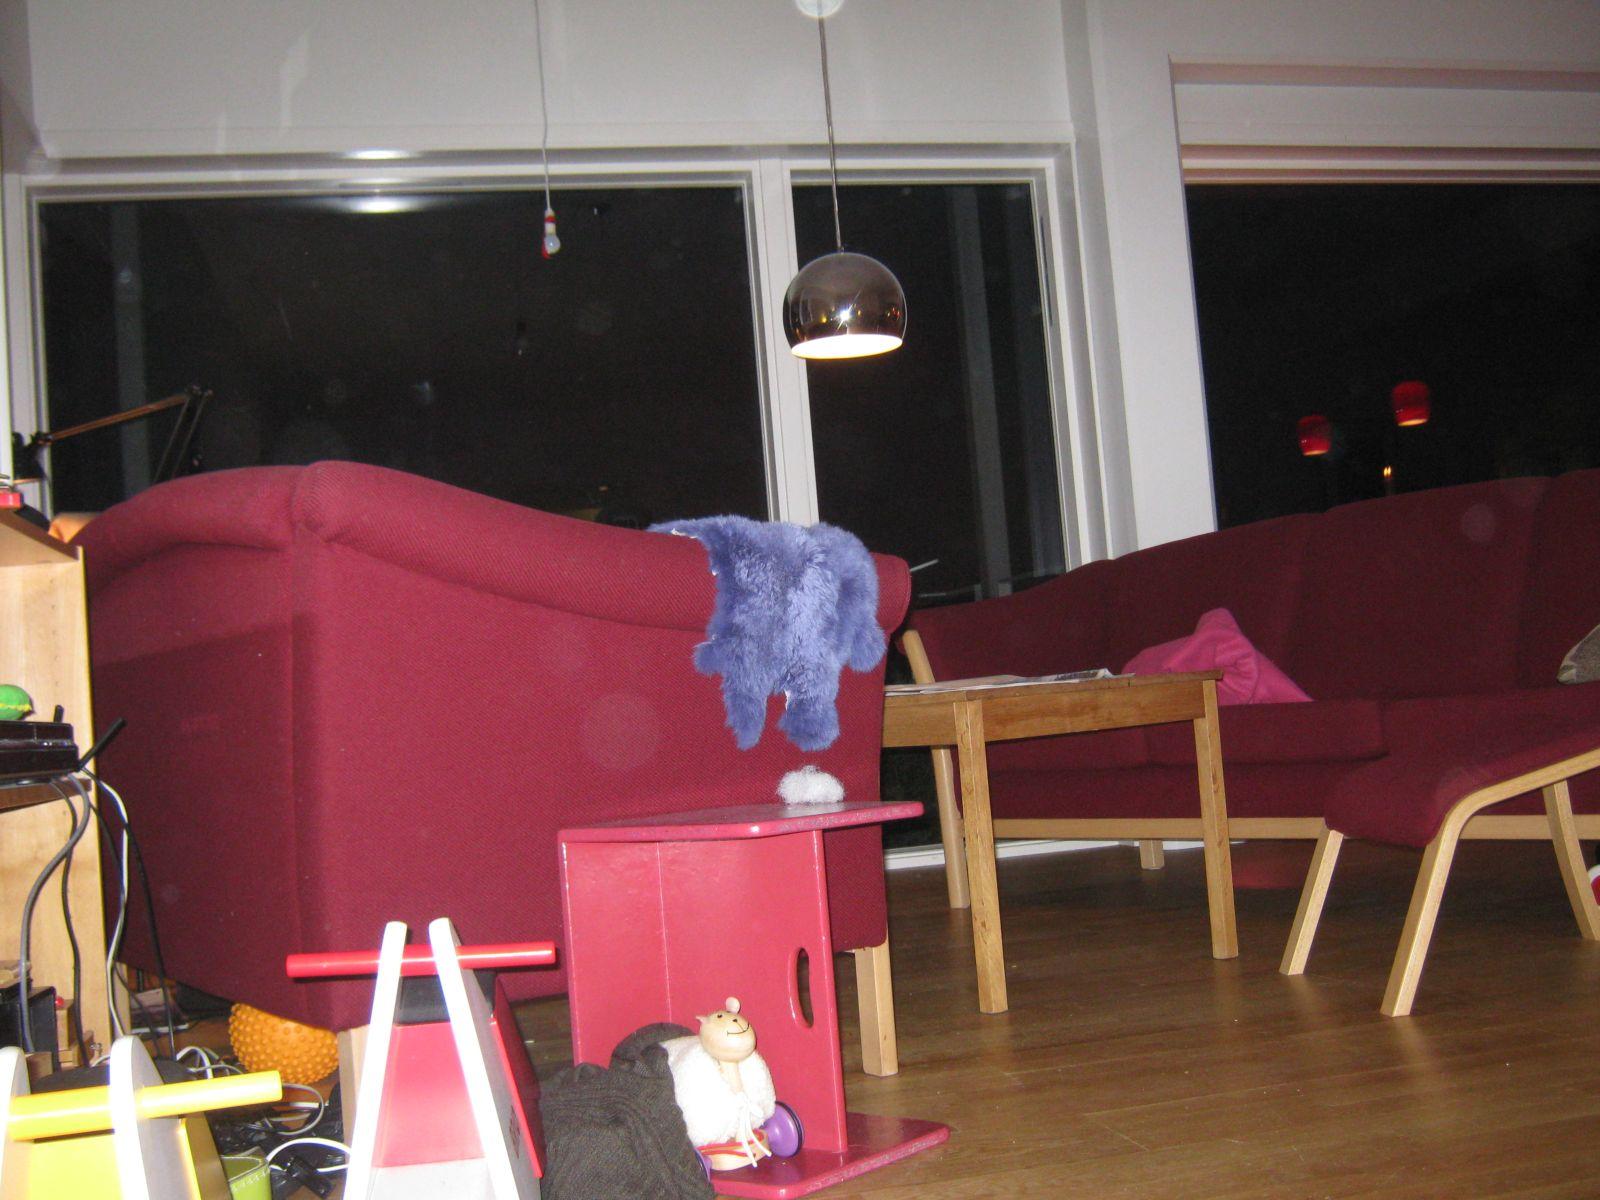 2010-01-08-1826_-_Indretning